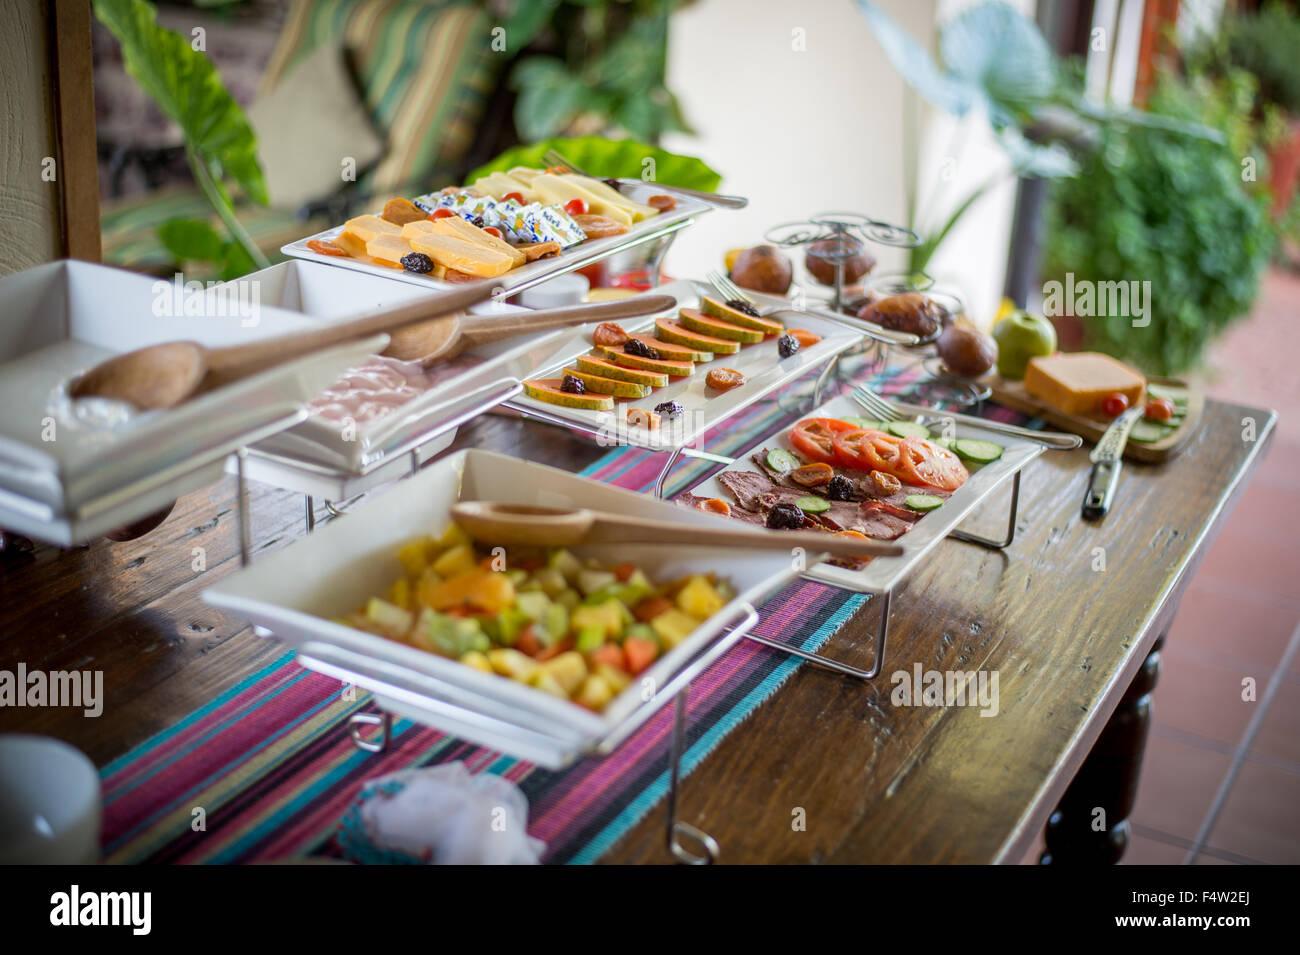 Kasane, Botswana - Table with healthy snacks. - Stock Image